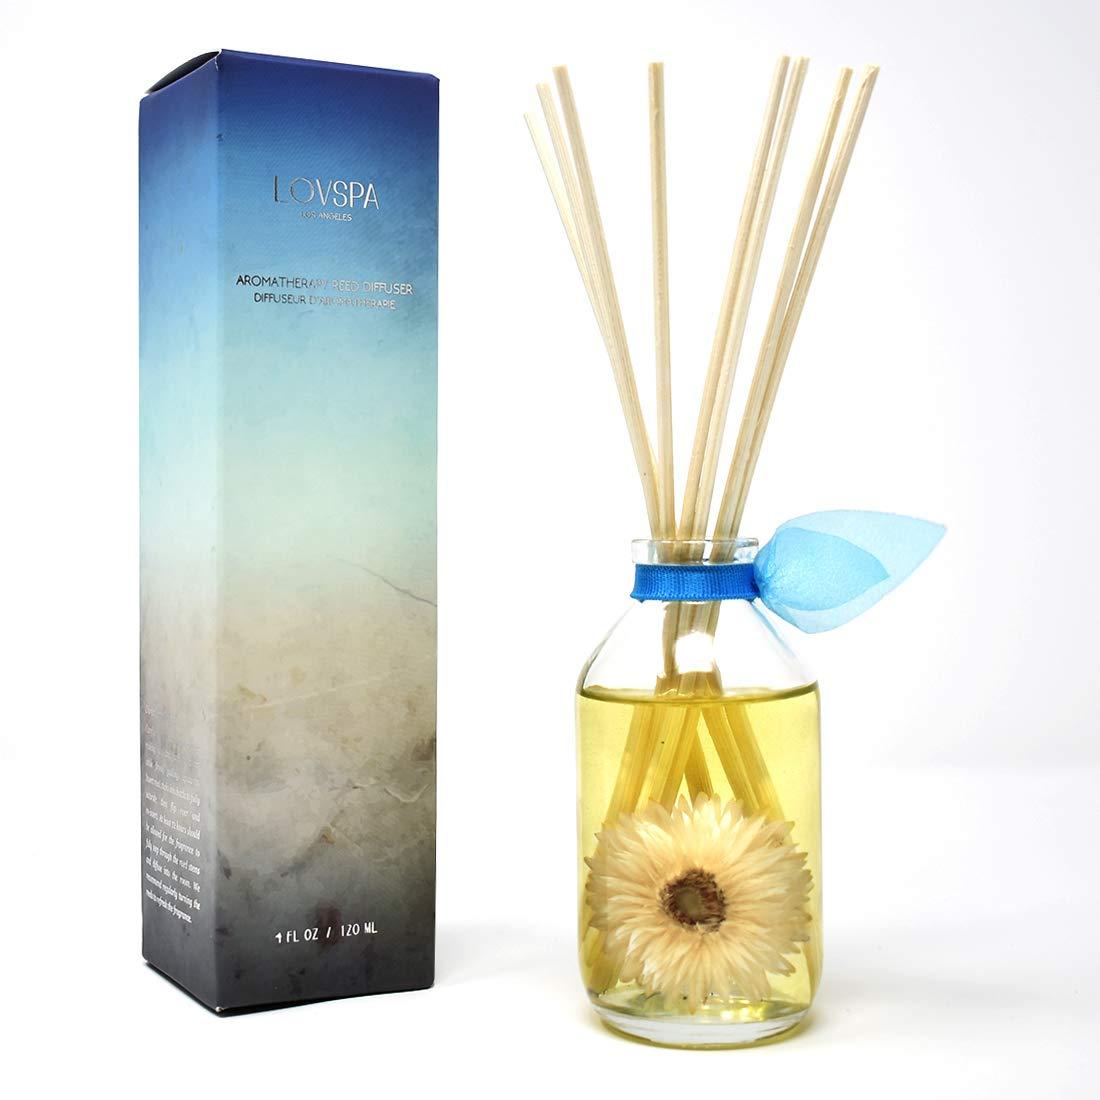 LOVSPA Ocean Flowers Reed Diffuser Oil Set | Verbena, Lily, Rose, Sandalwood & Cedar | Home Room Freshener with Real Seashells | Beautiful Beach House Decor Makes a Great Gift Idea